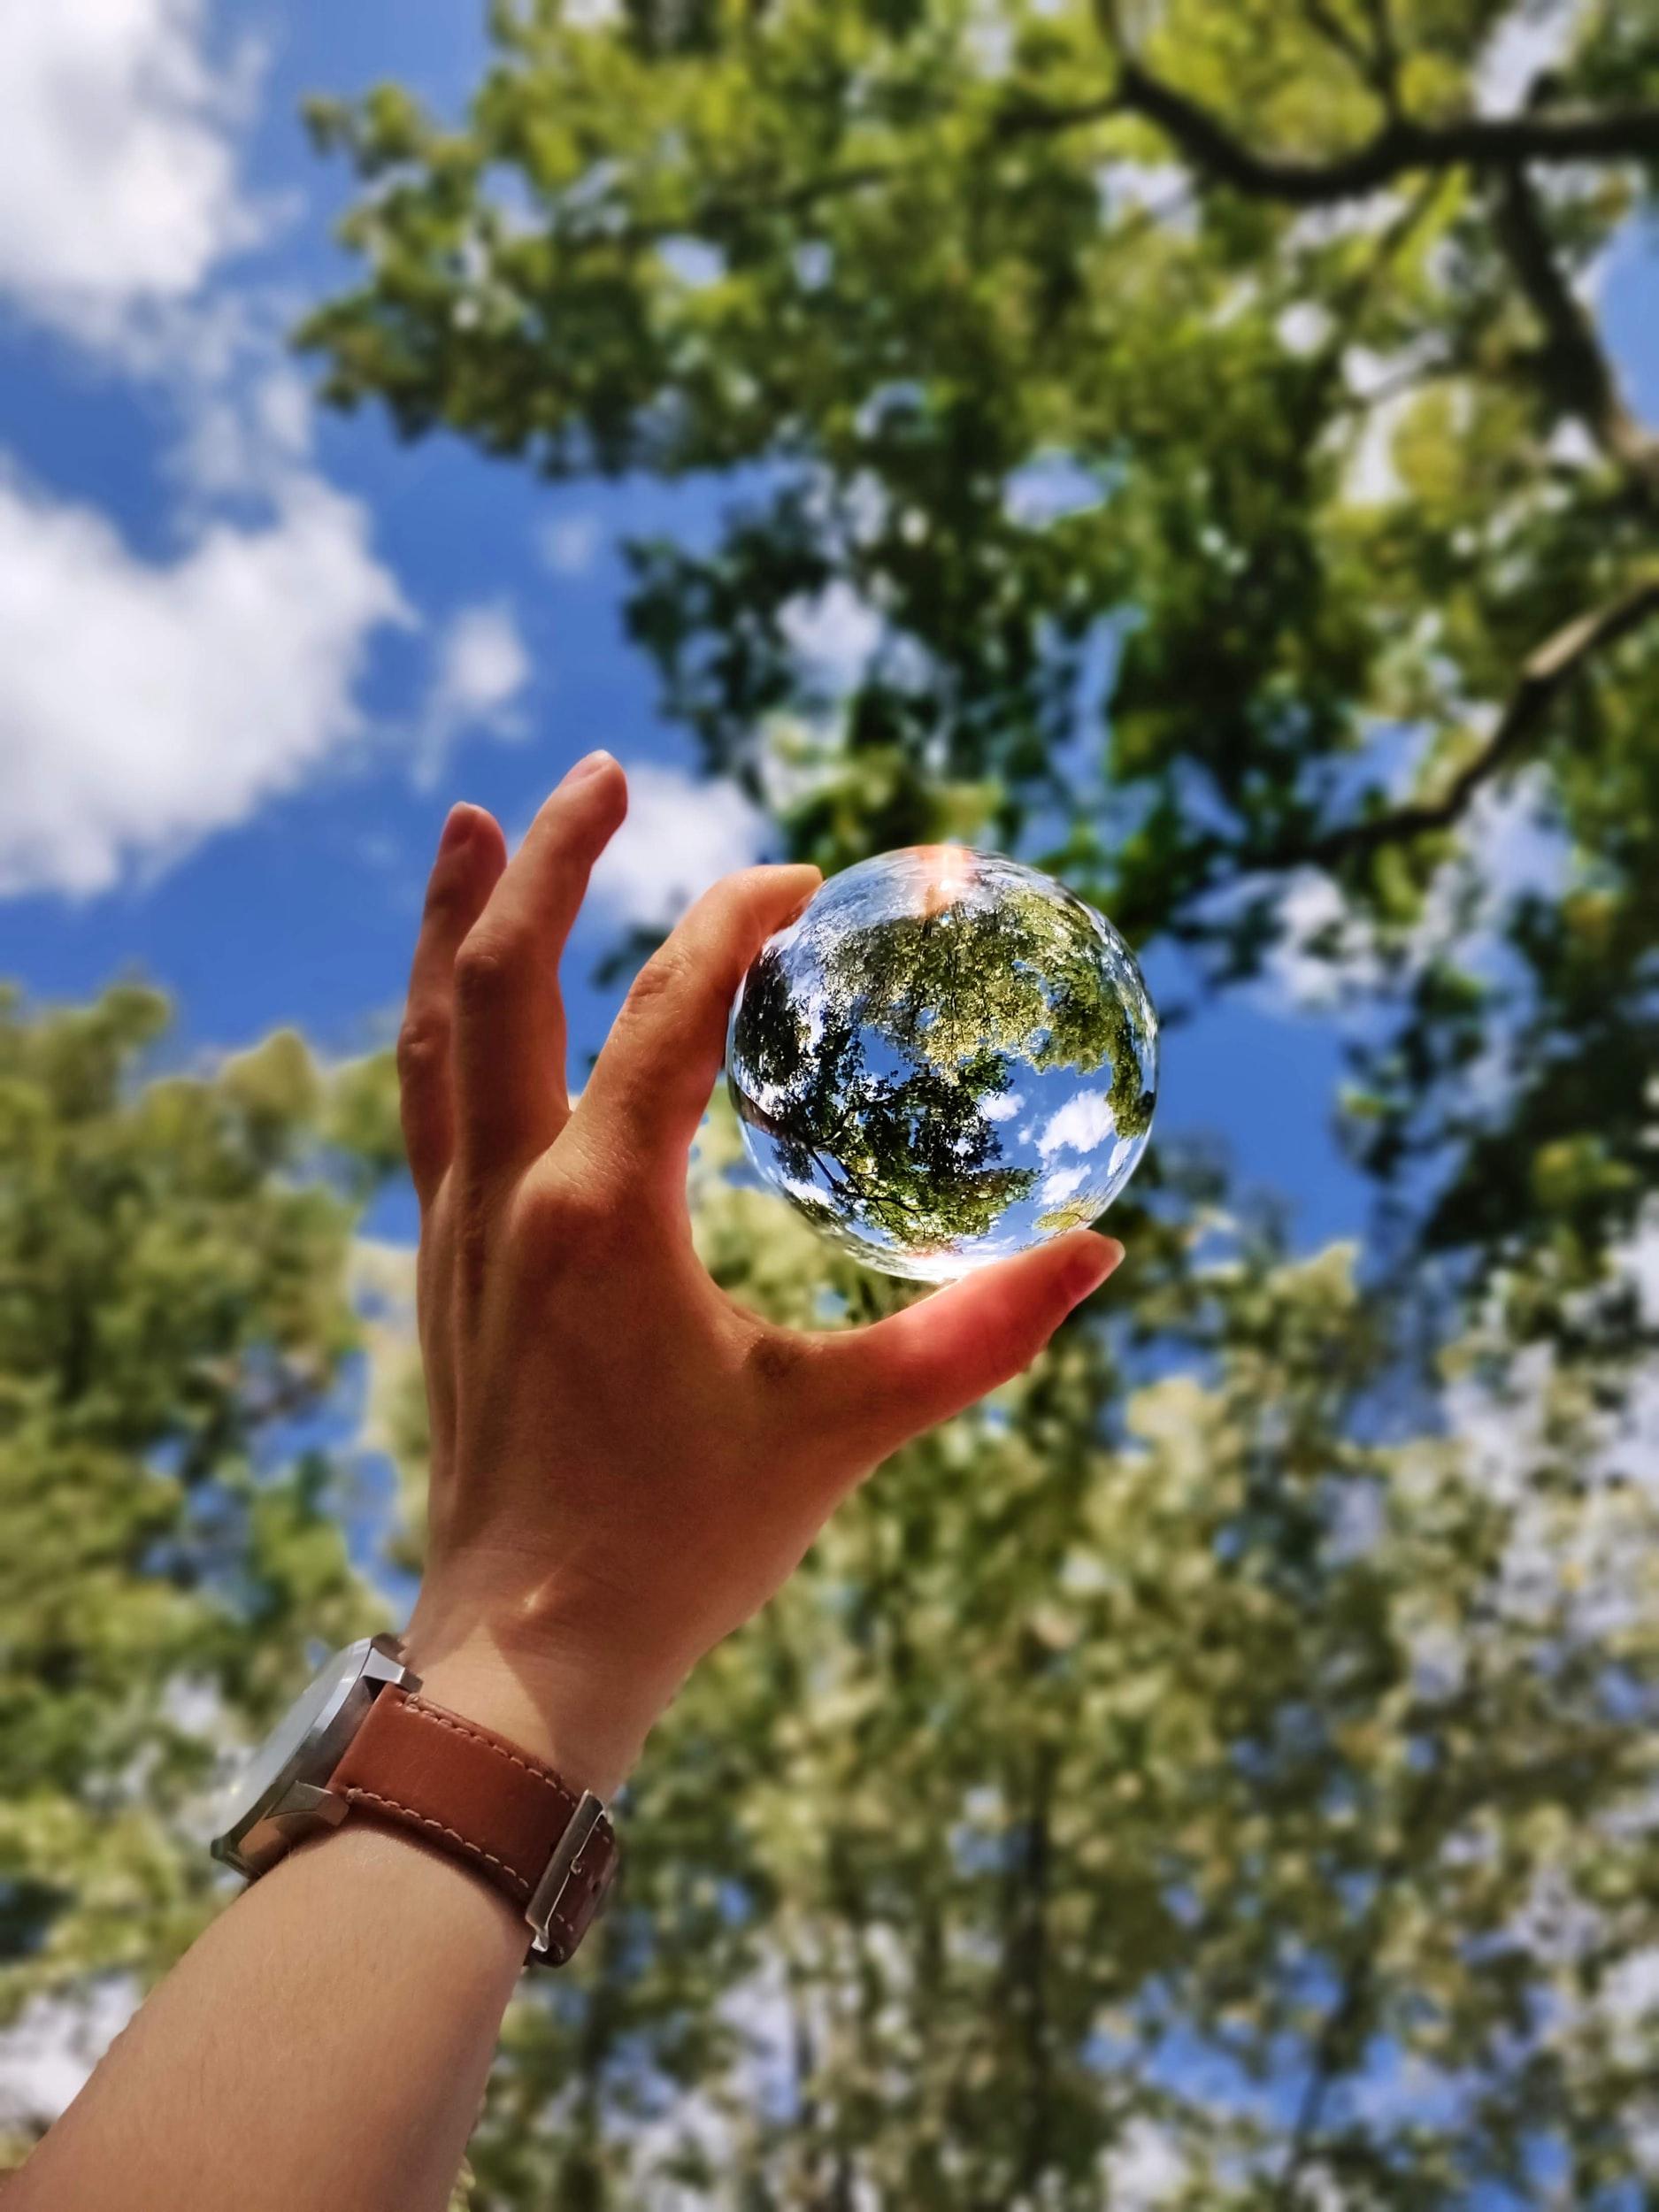 Hand holding up a glass globe against a leafy backdrop. Photo by Margot Richard on unsplash.com